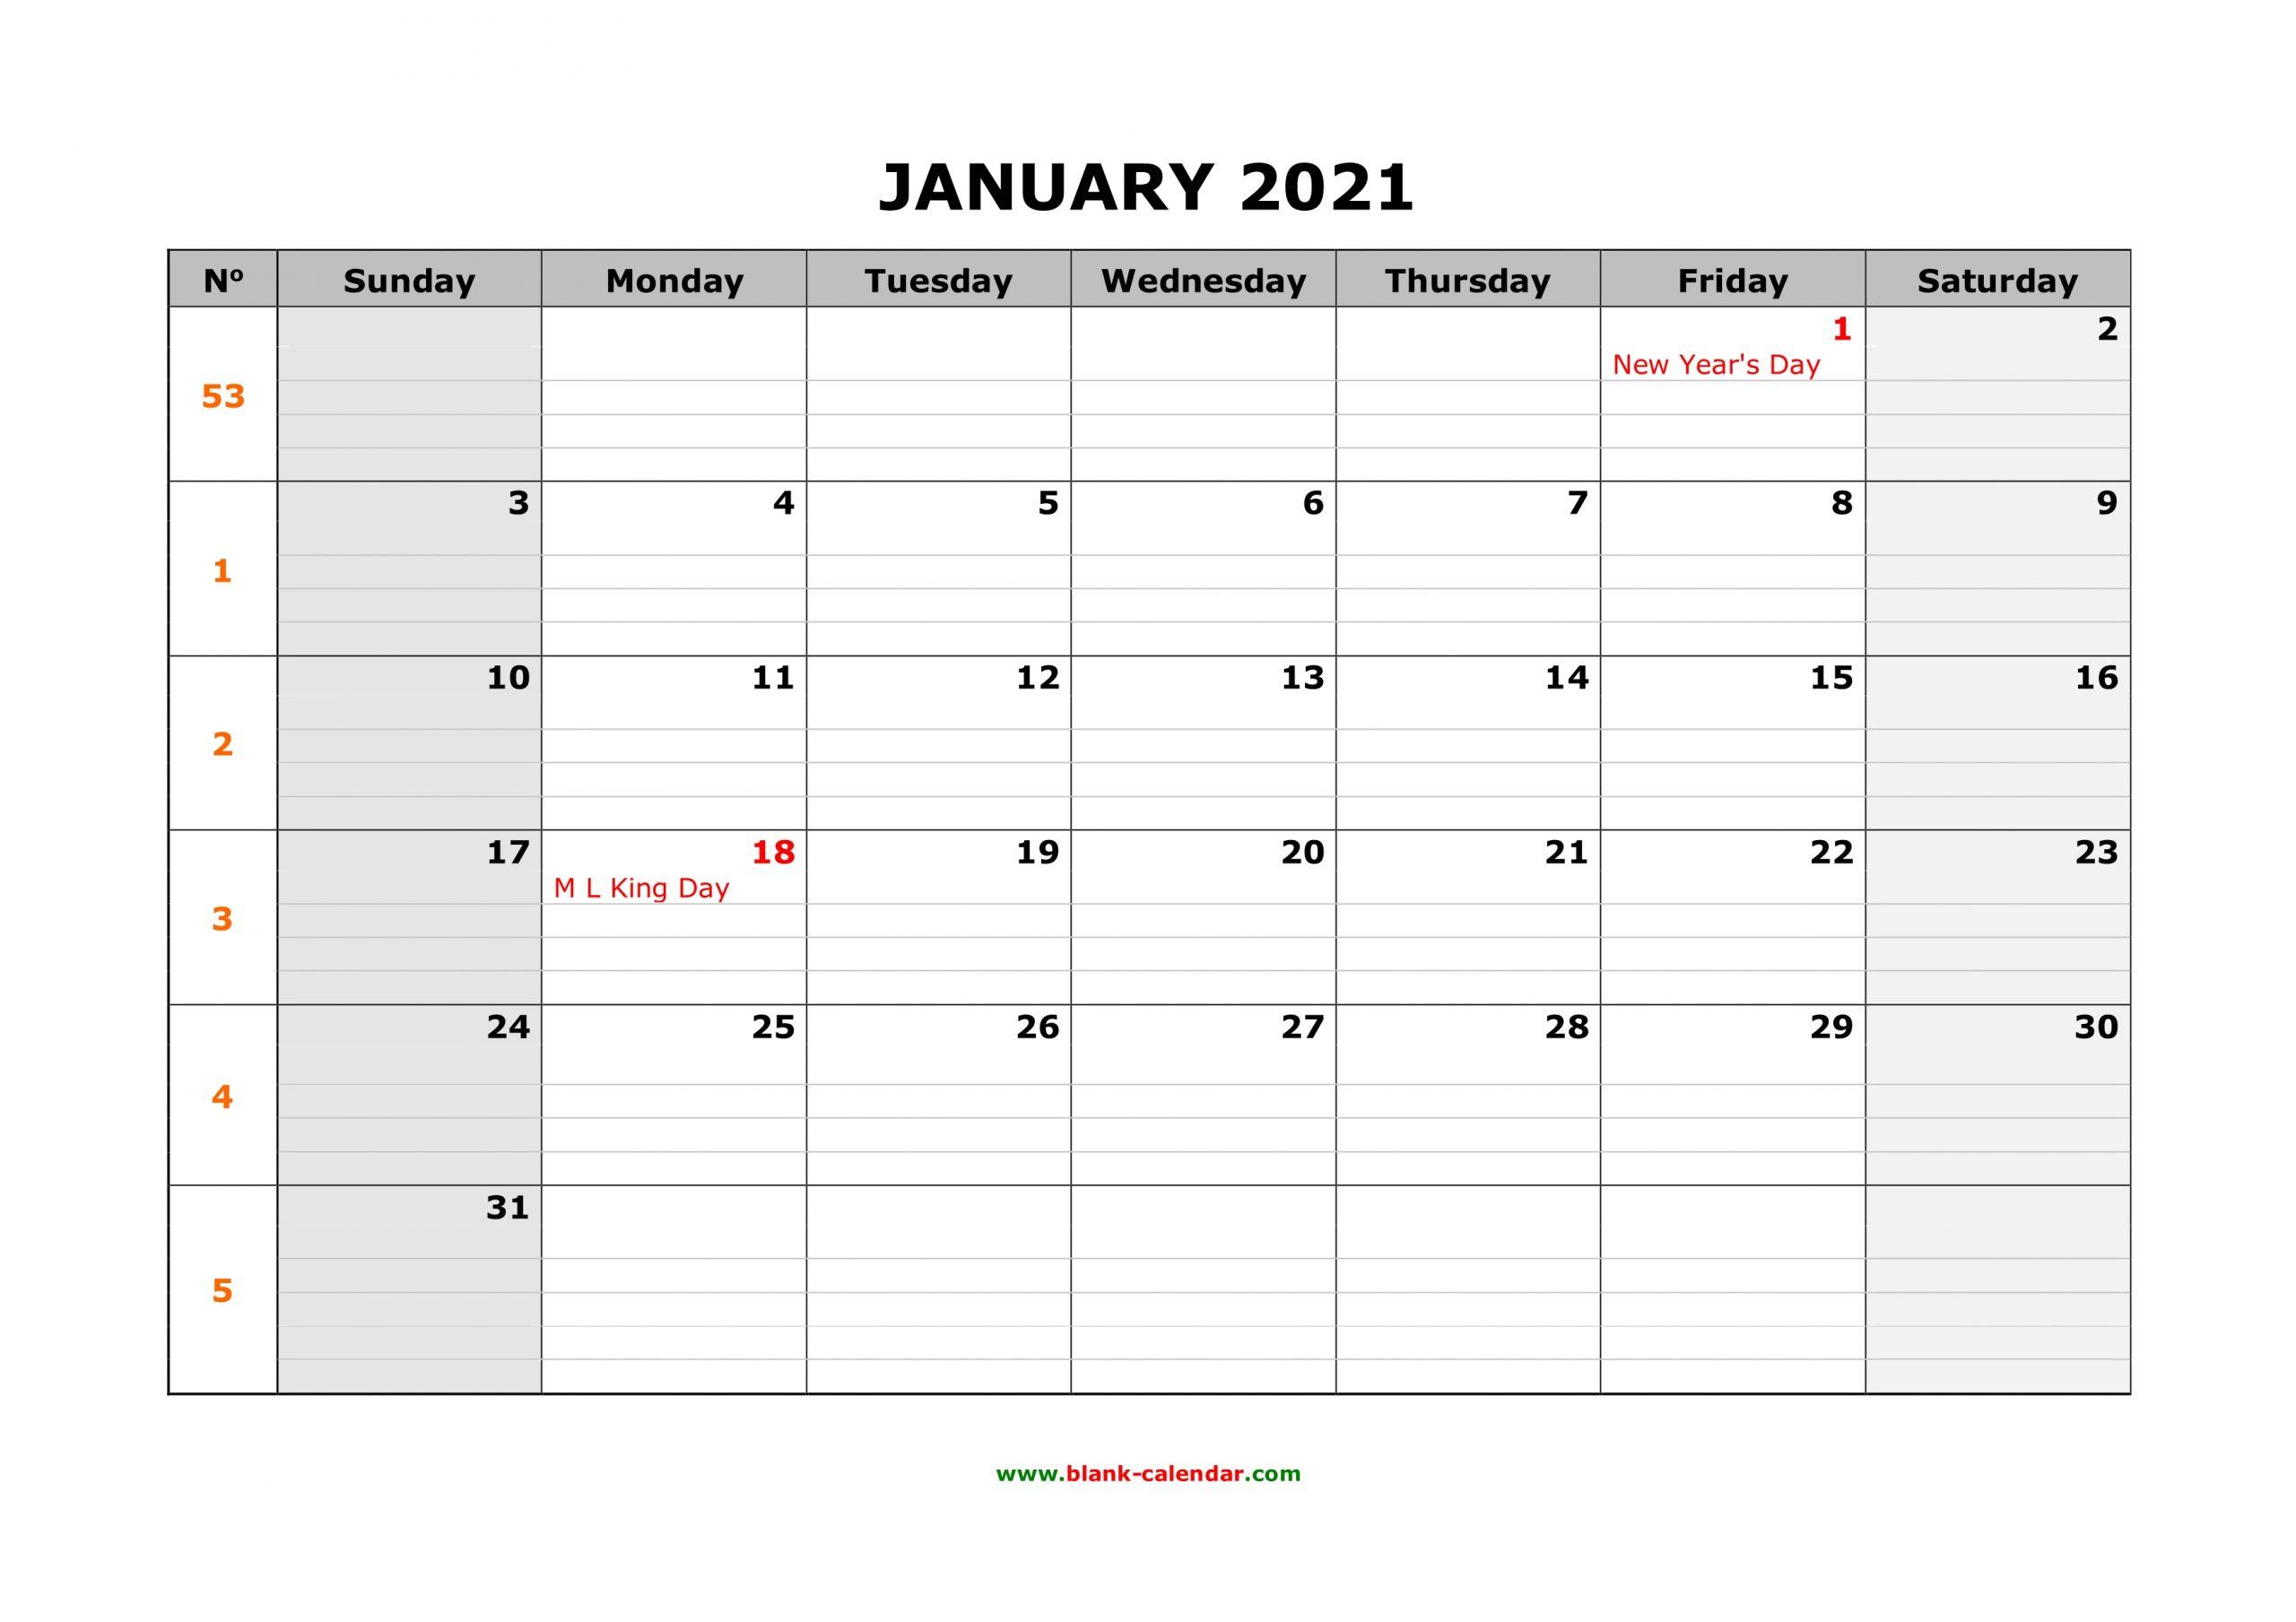 Free Download Printable Calendar 2021 Large Box Grid intended for Blank 2021 Calendar Printable Free